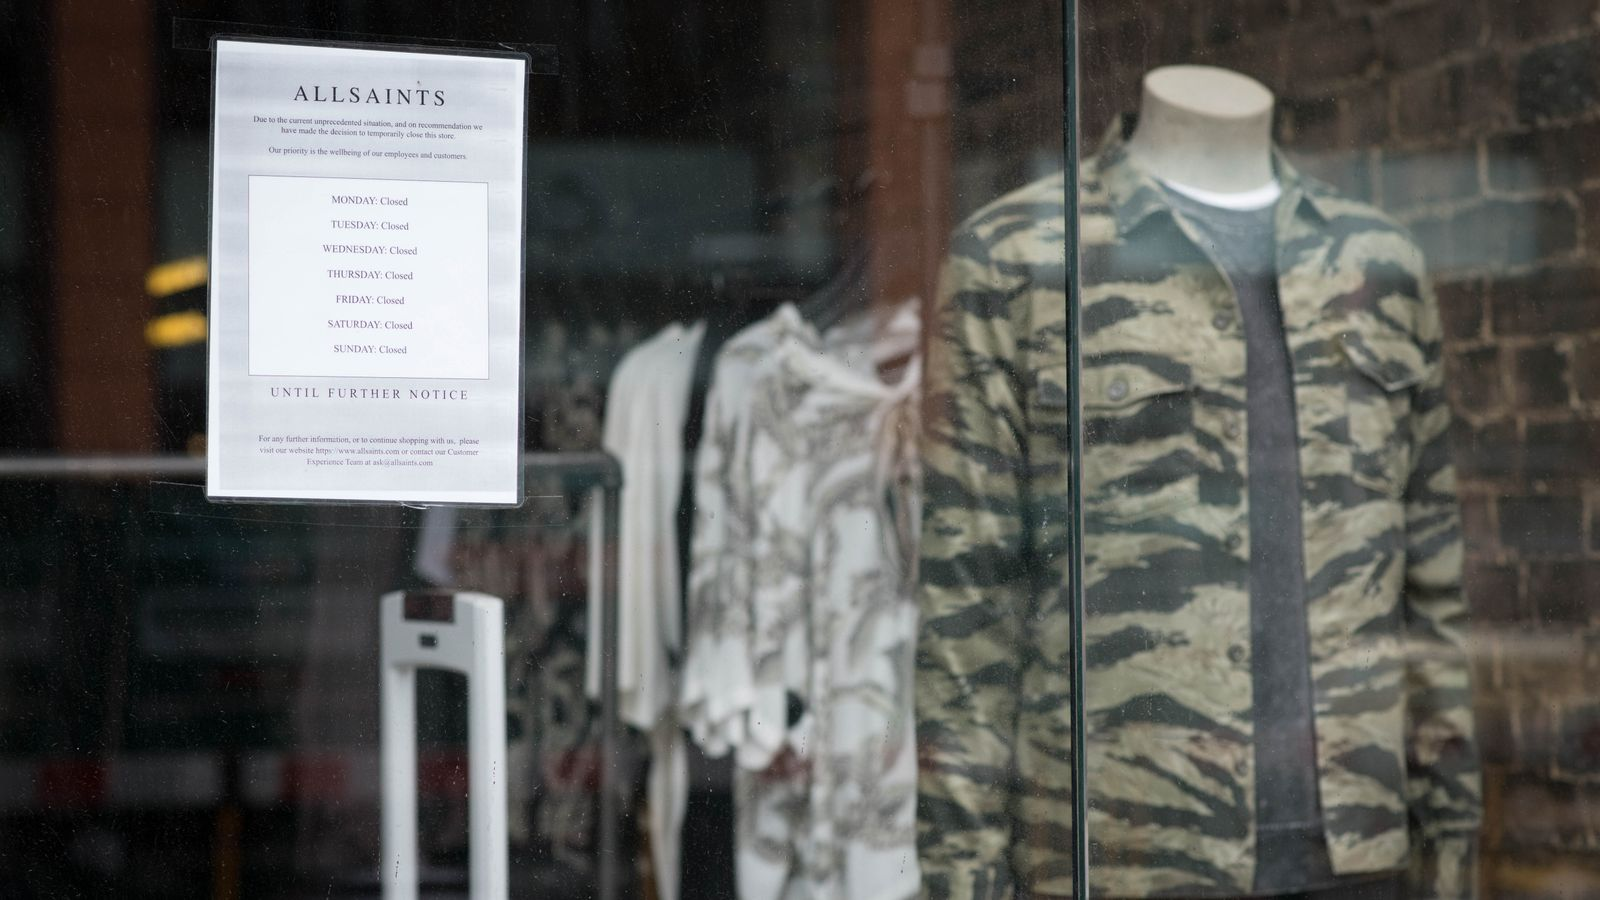 Coronavirus: All Saints fashions CVA plan amid high street crisis | Business News